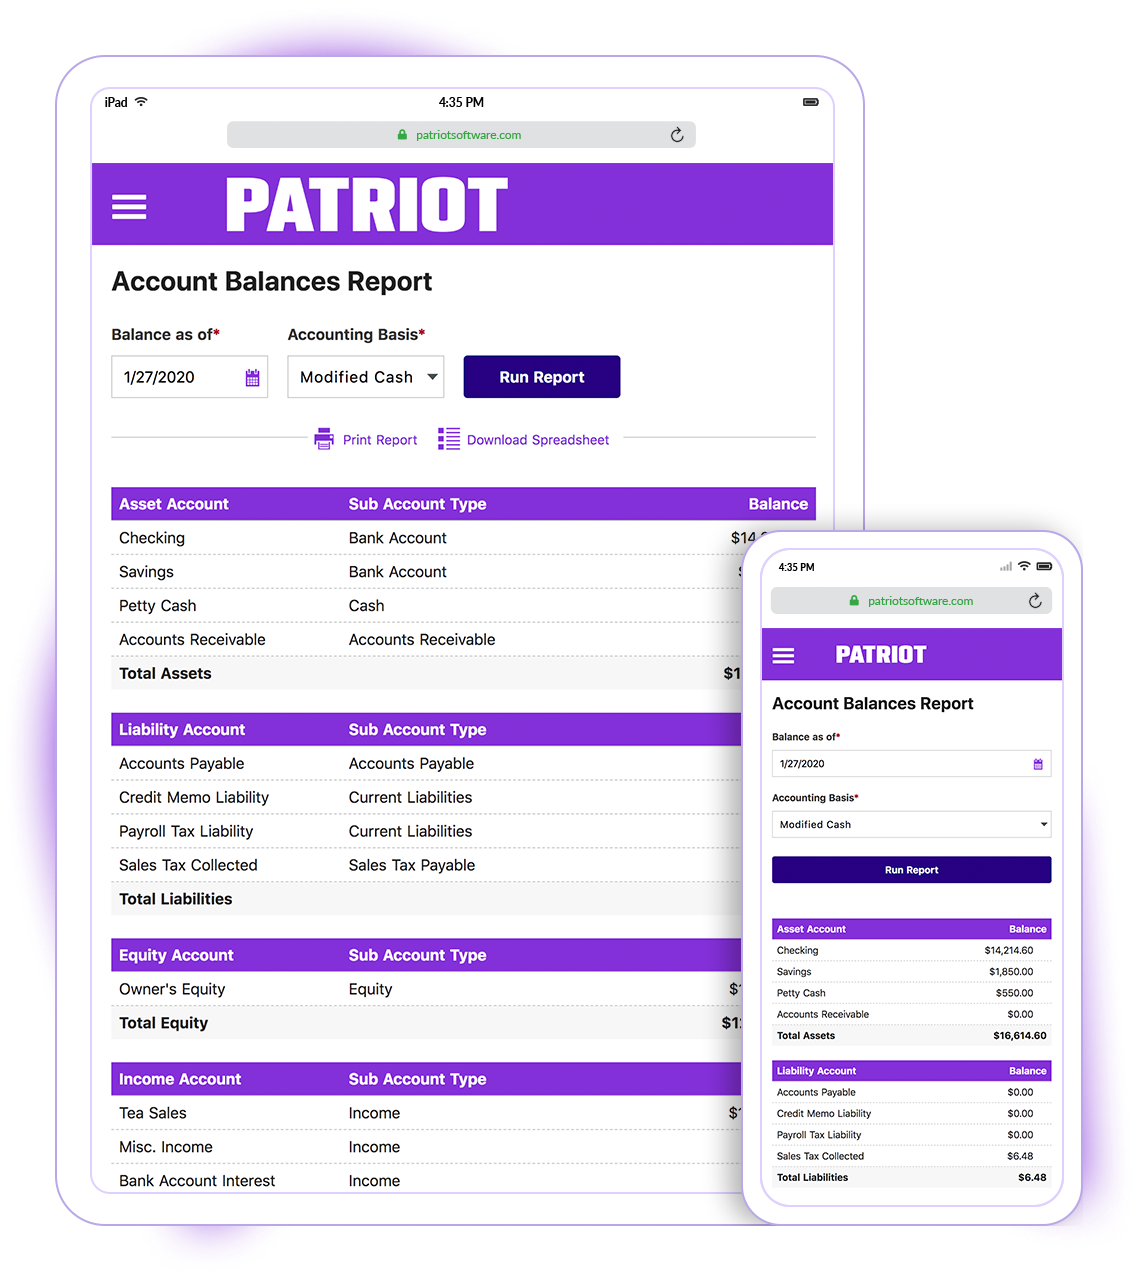 Patriot Accounting Logiciel - 4